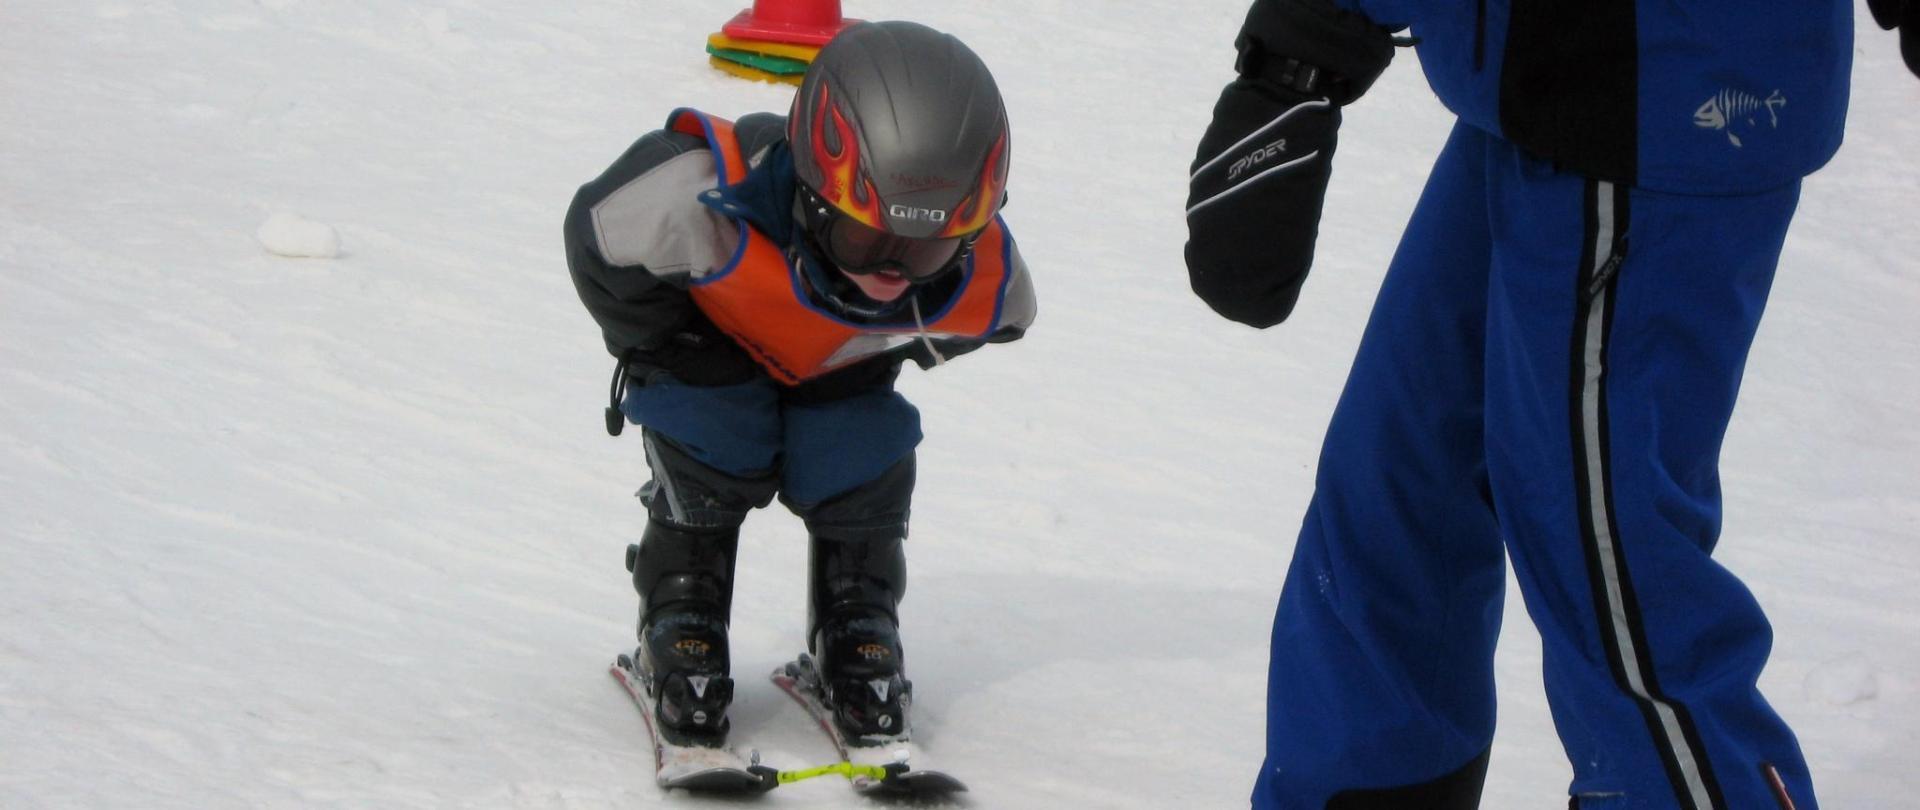 Ski Instructor w- kid.JPG